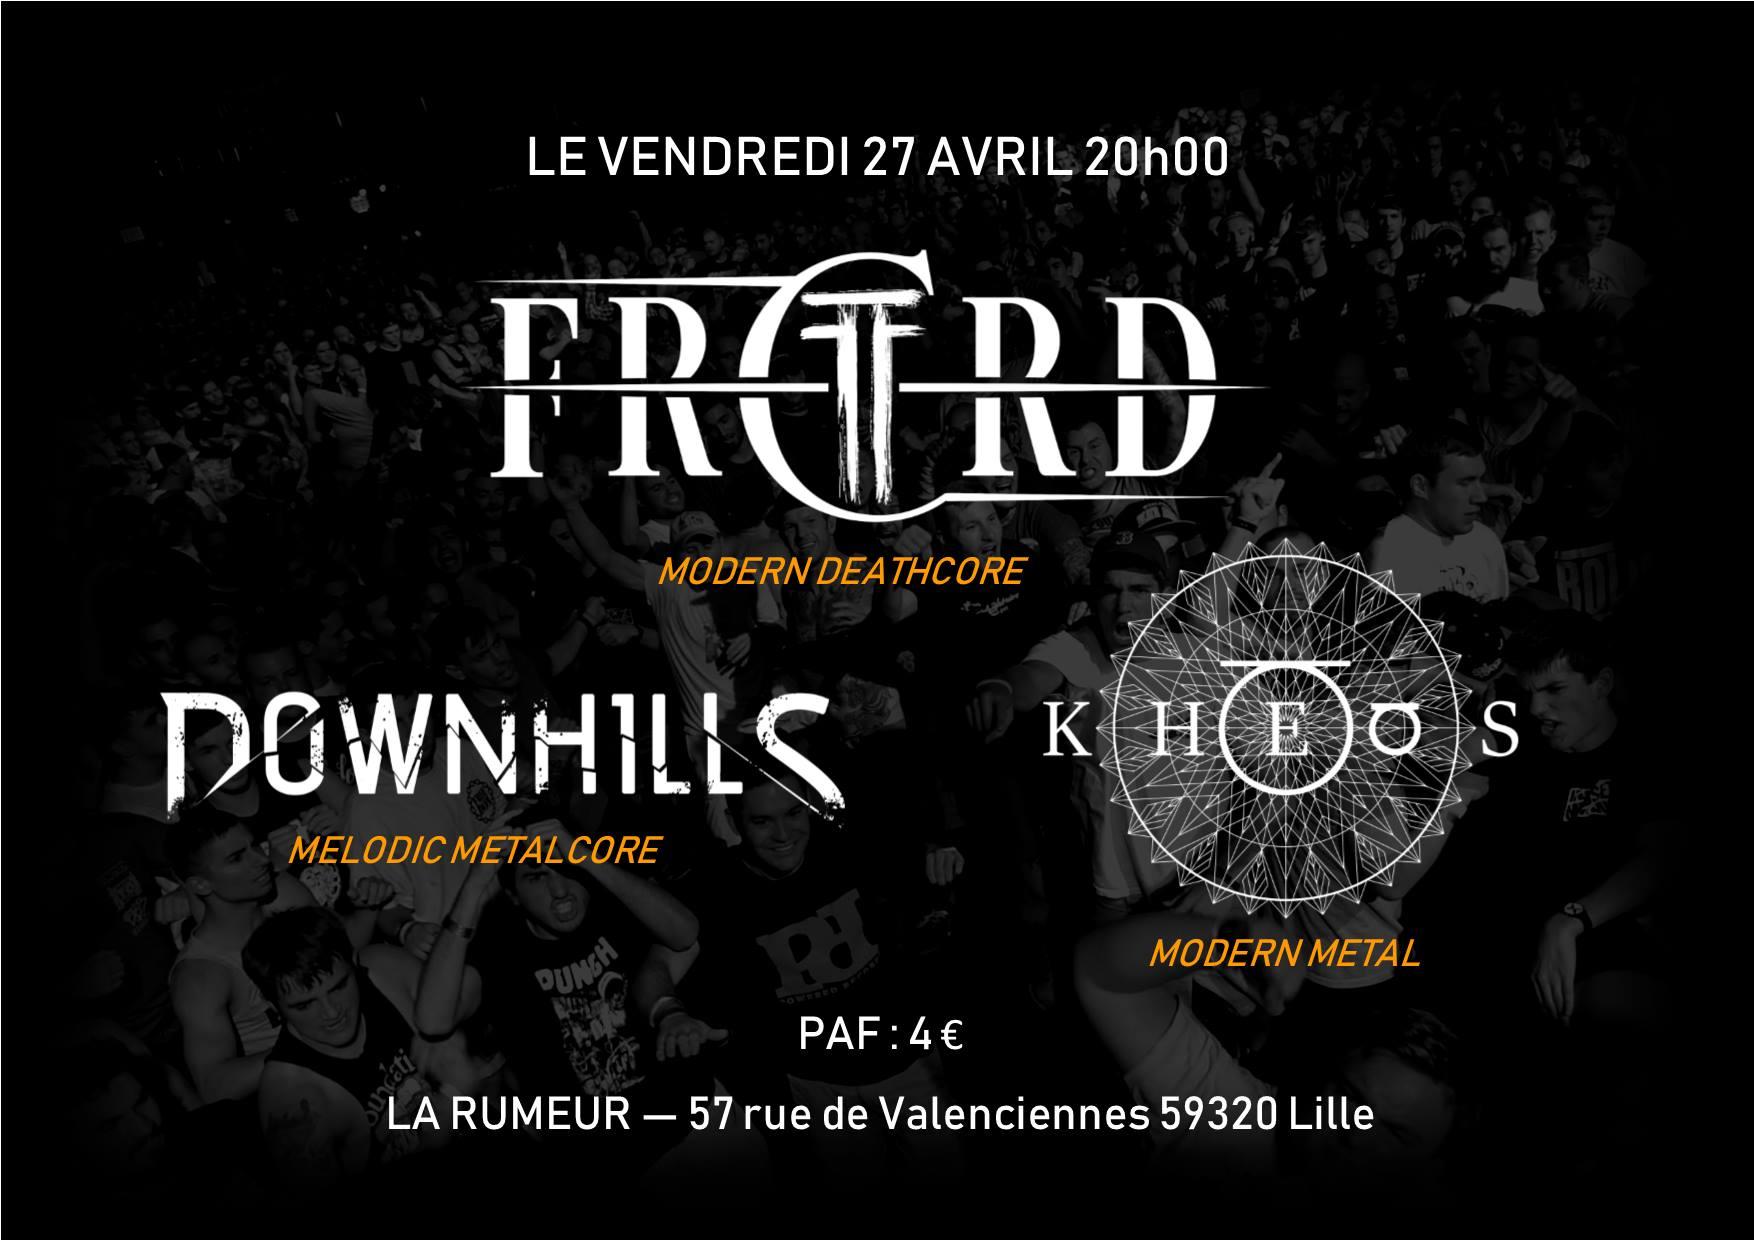 FRCTRD + Downhills + Kheos